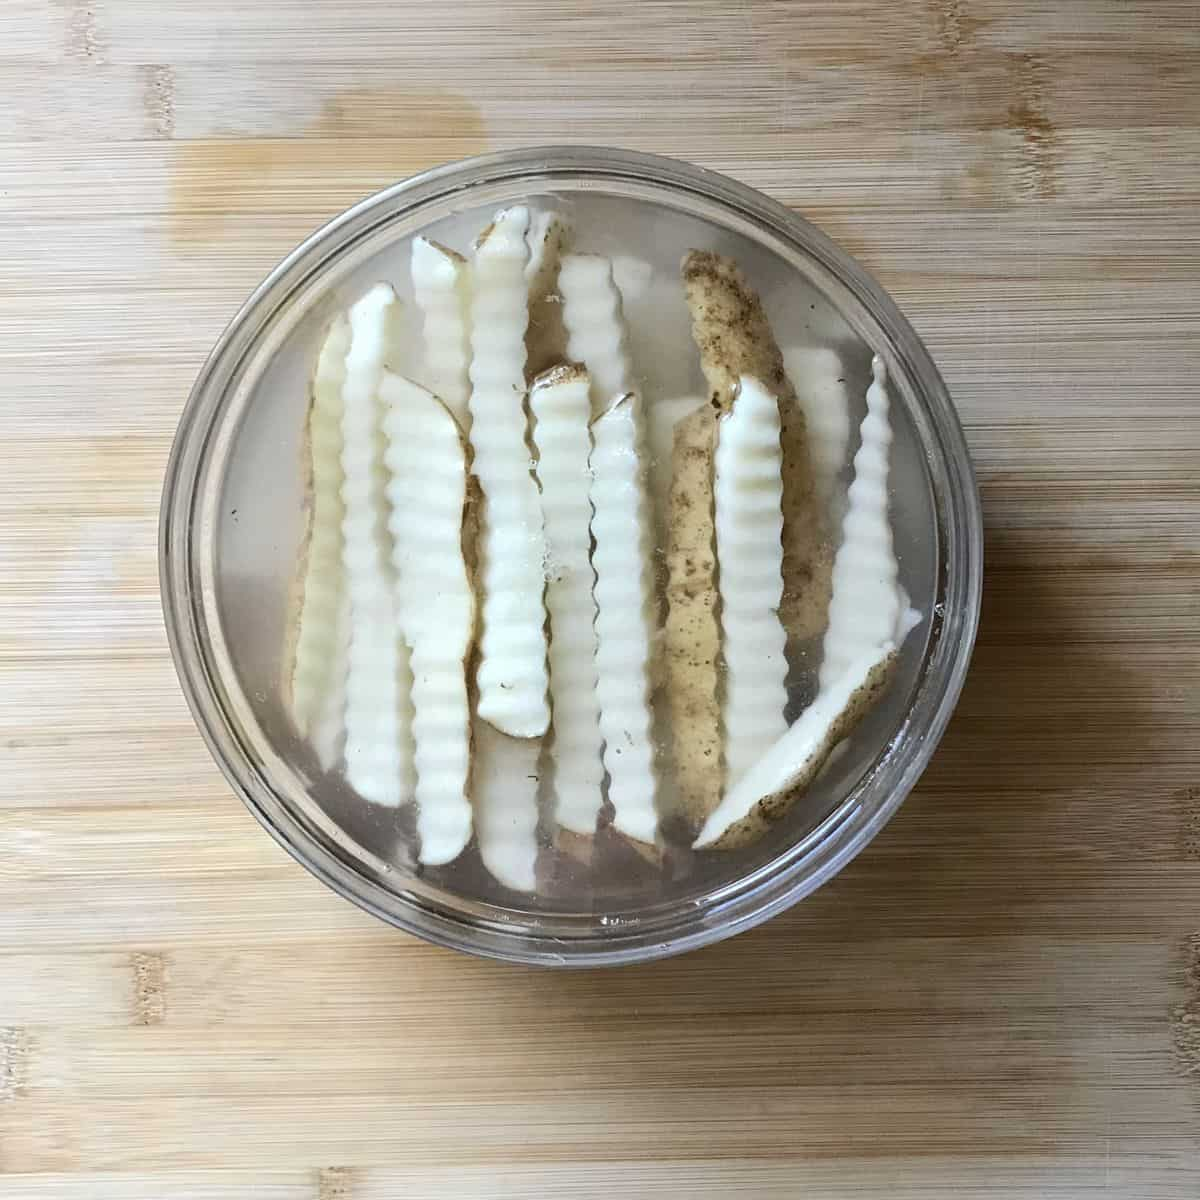 Crinkle cut potatoes soaking in a bowl of water.